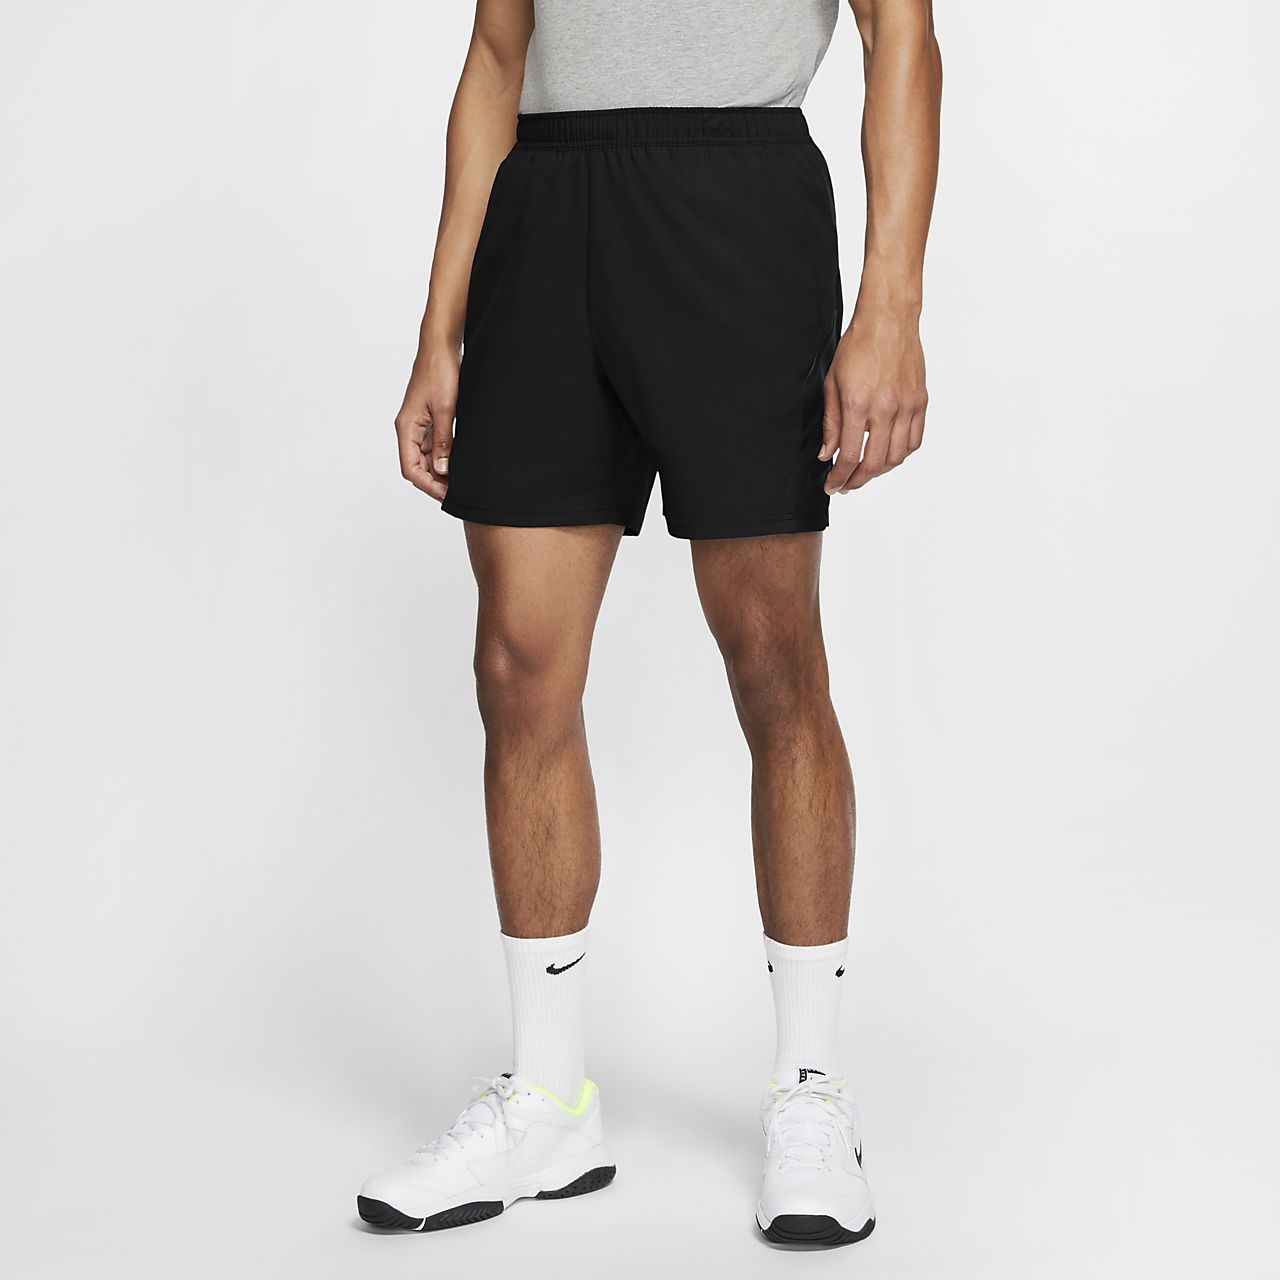 aa6ae6868 NikeCourt Dri-FIT Men's Tennis Shorts. Nike.com